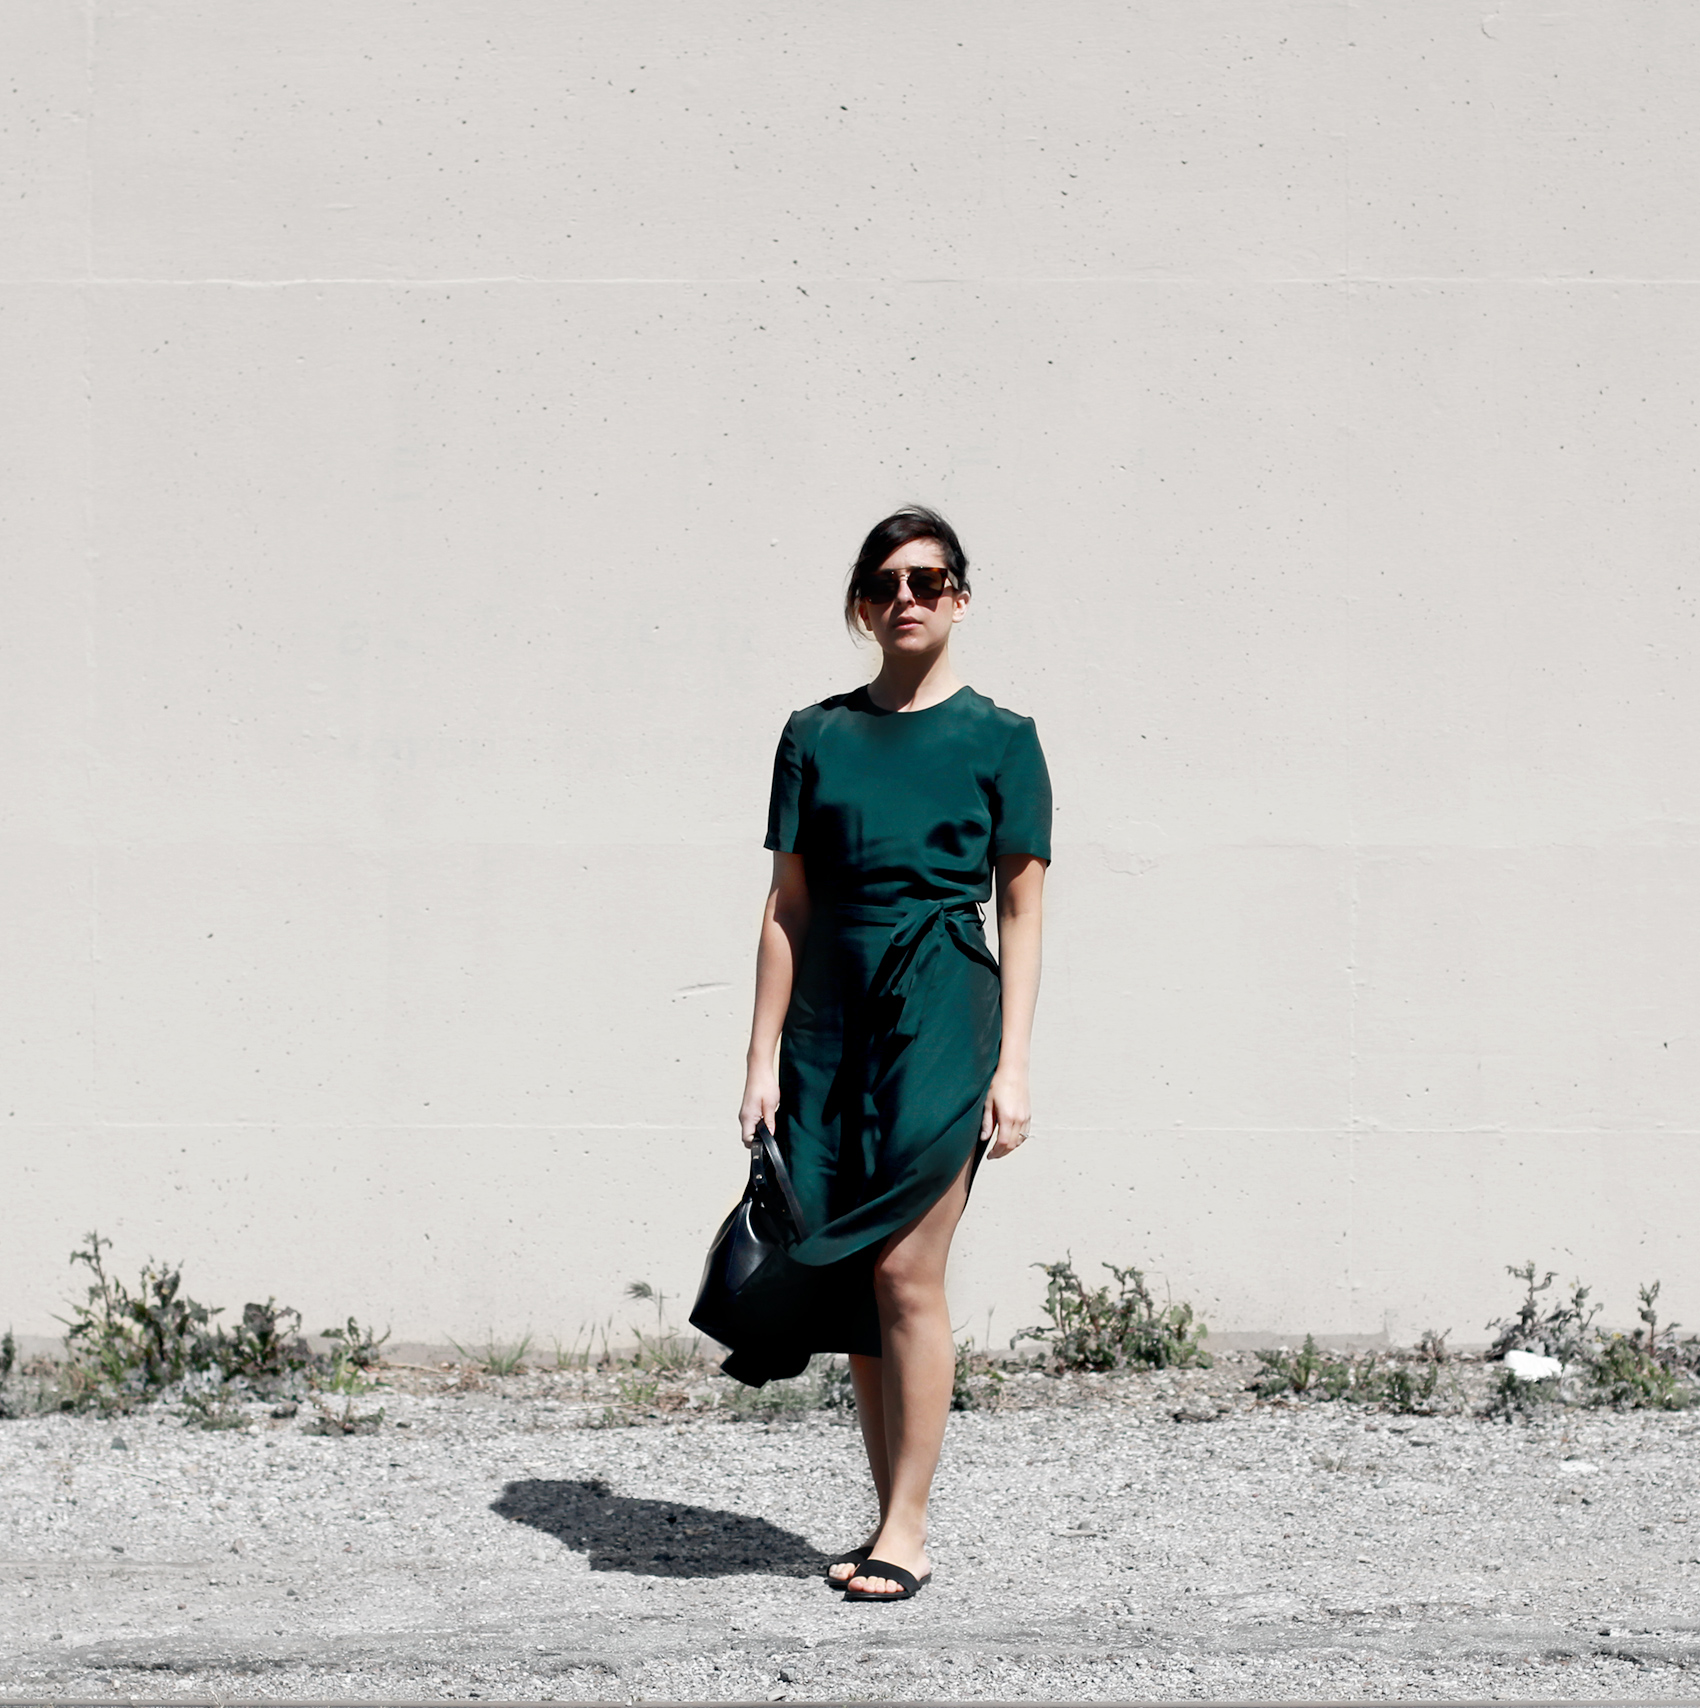 854-twelvoefour-1700-bucket-bag-summer-dress-IMG_7156.jpg